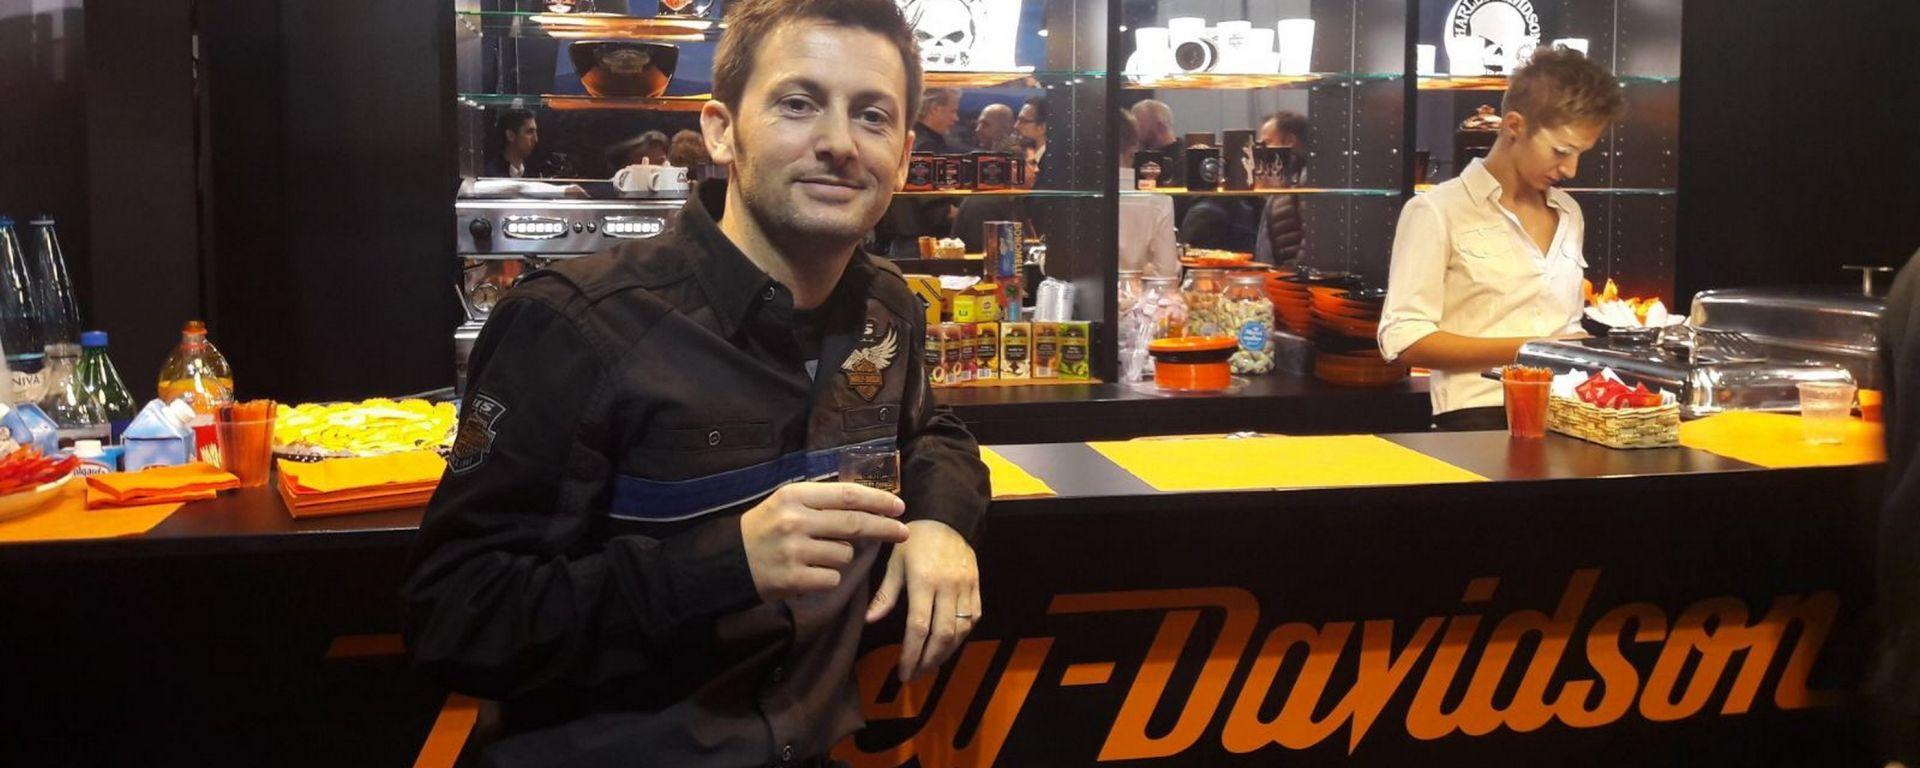 Giacomo Marzoli, Responsabile Marketing di Harley-Davidson Italia